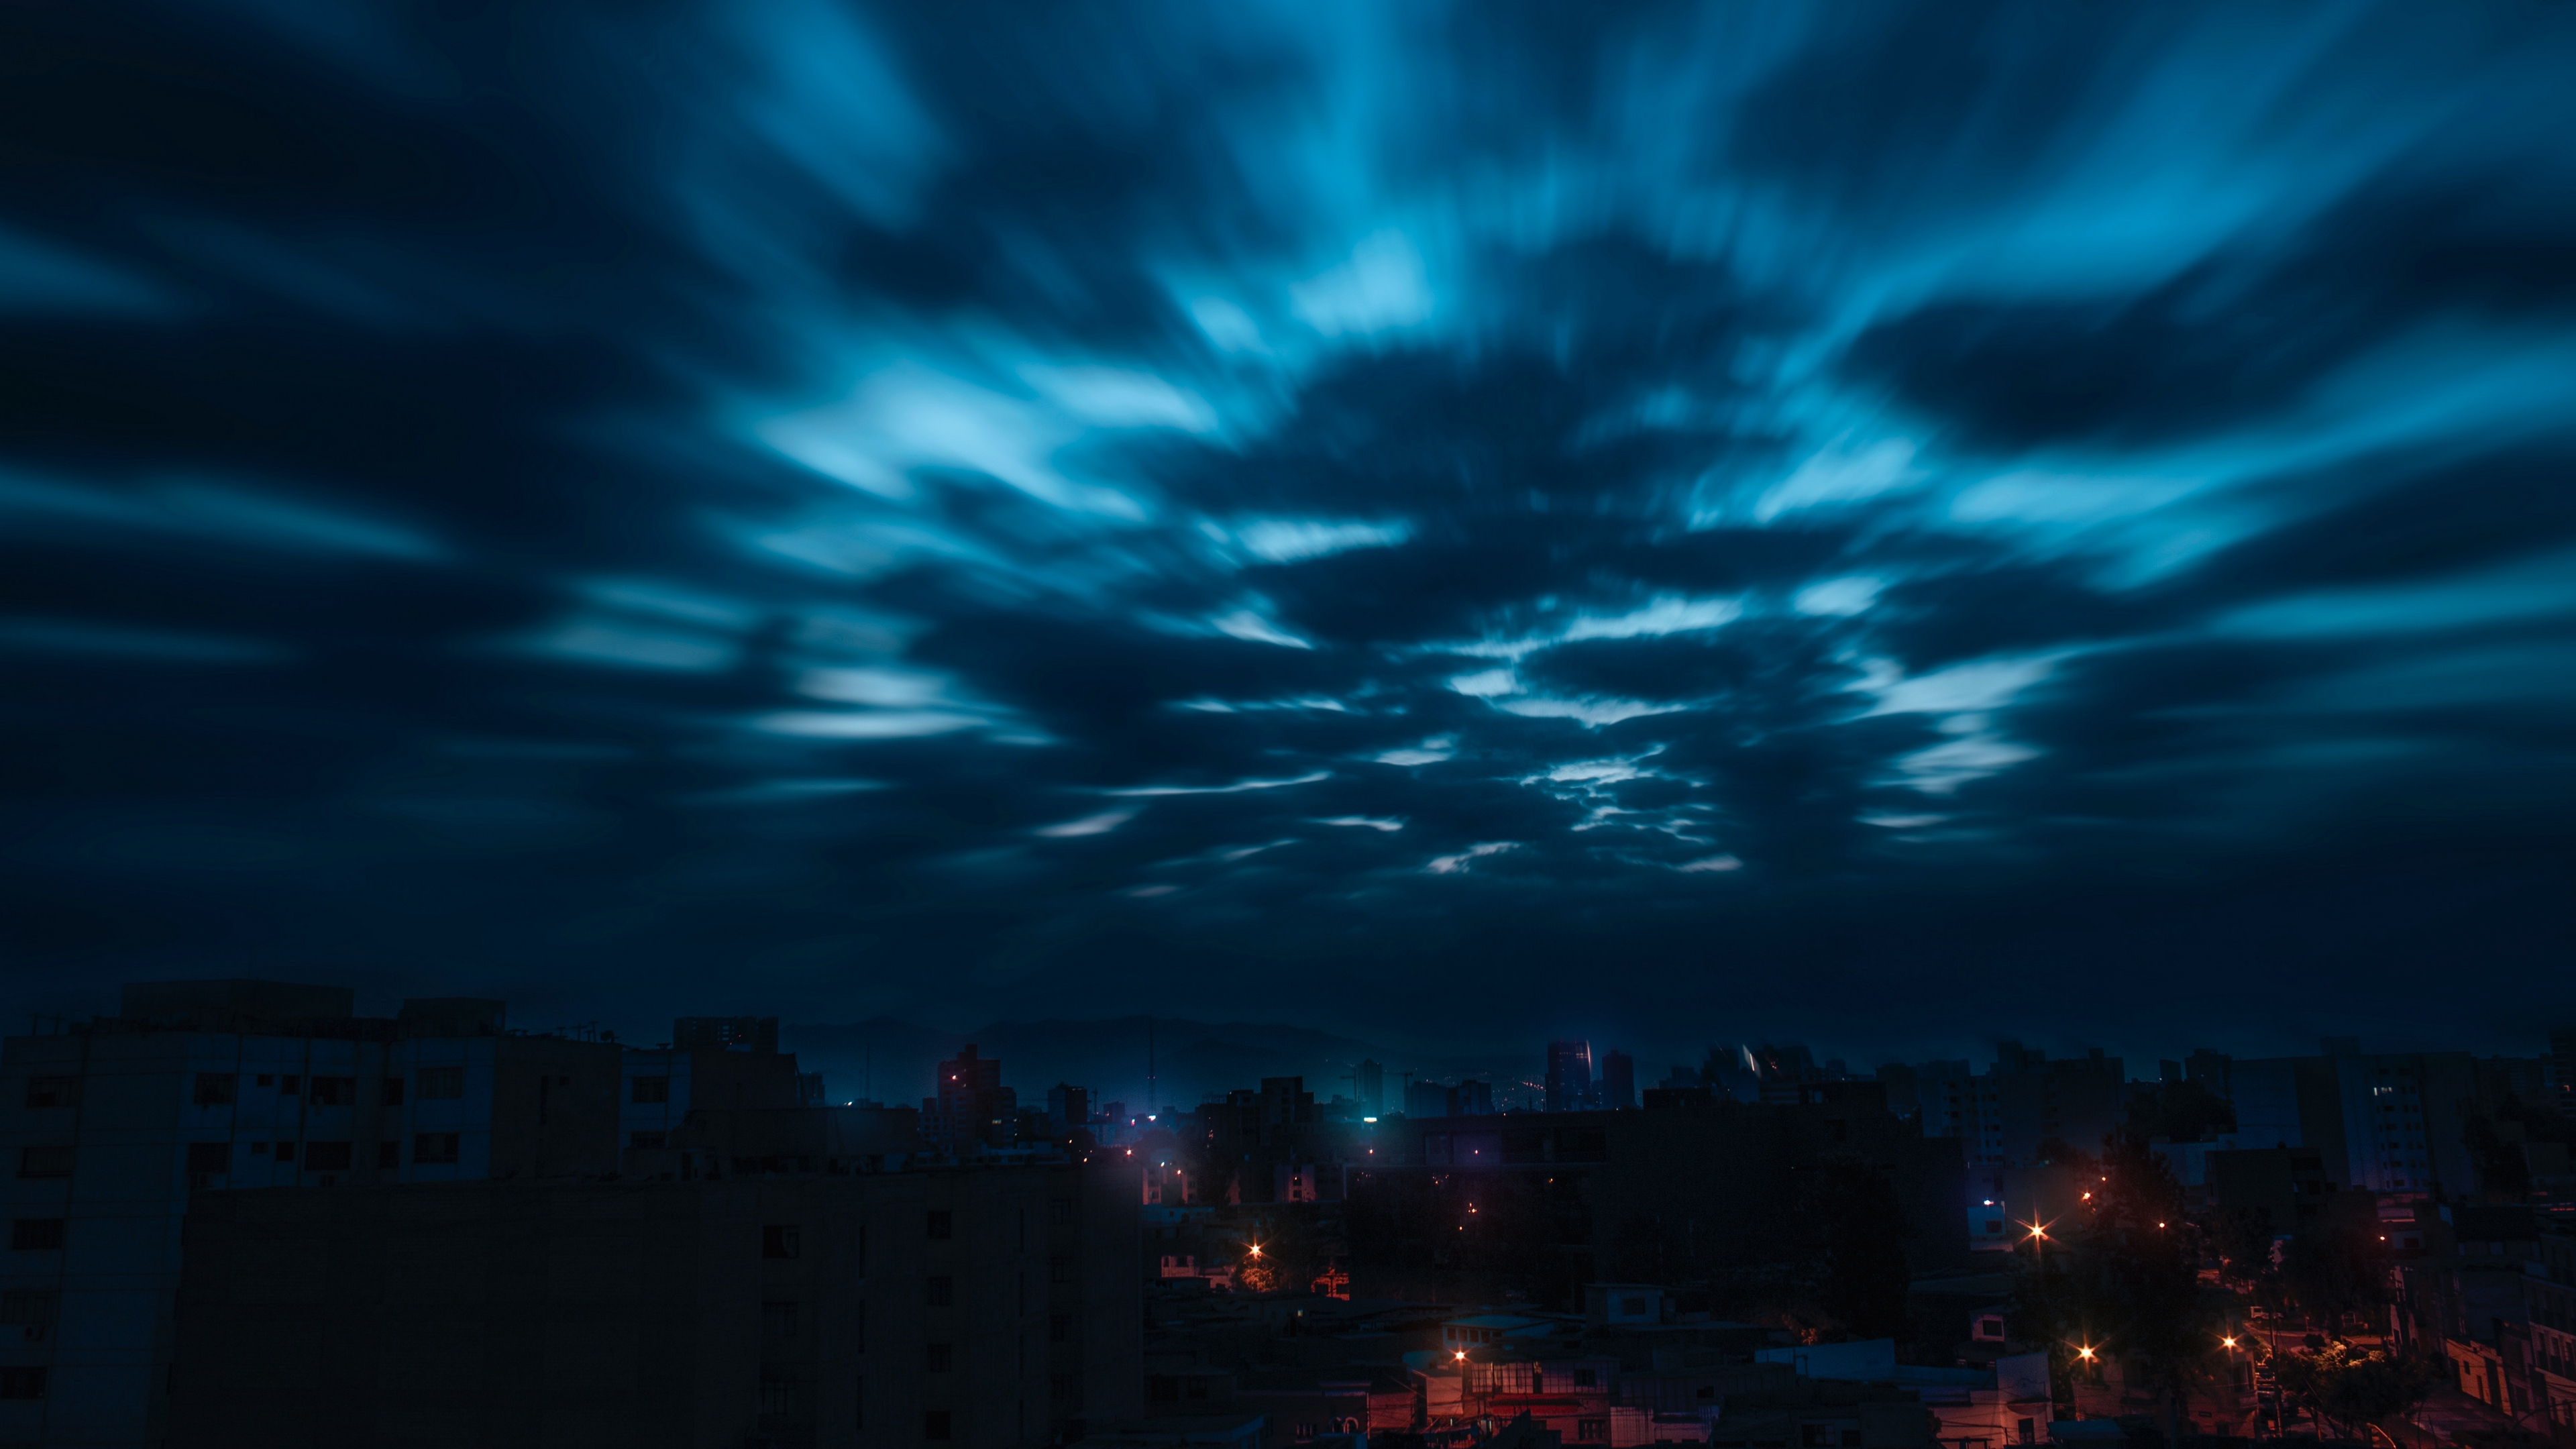 sky clouds night city 4k 1538068453 - sky, clouds, night, city 4k - Sky, Night, Clouds